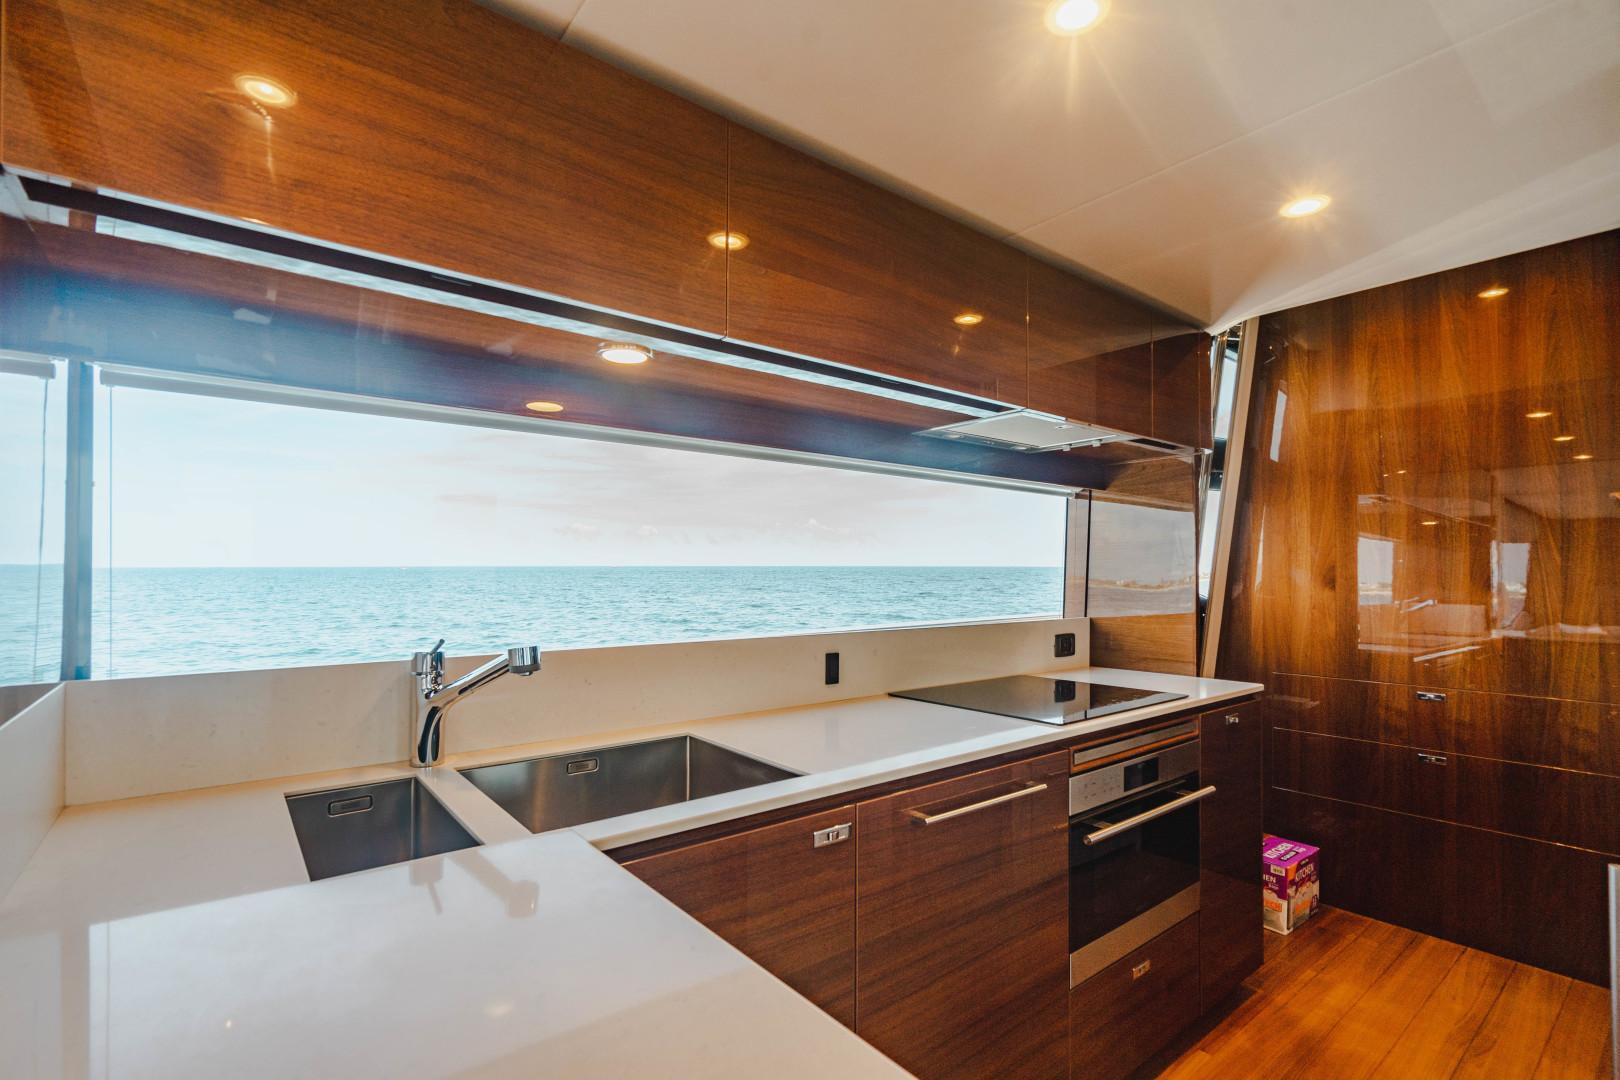 Princess-Y85  2019-Splash Delray Beach-Florida-United States-1631656 | Thumbnail